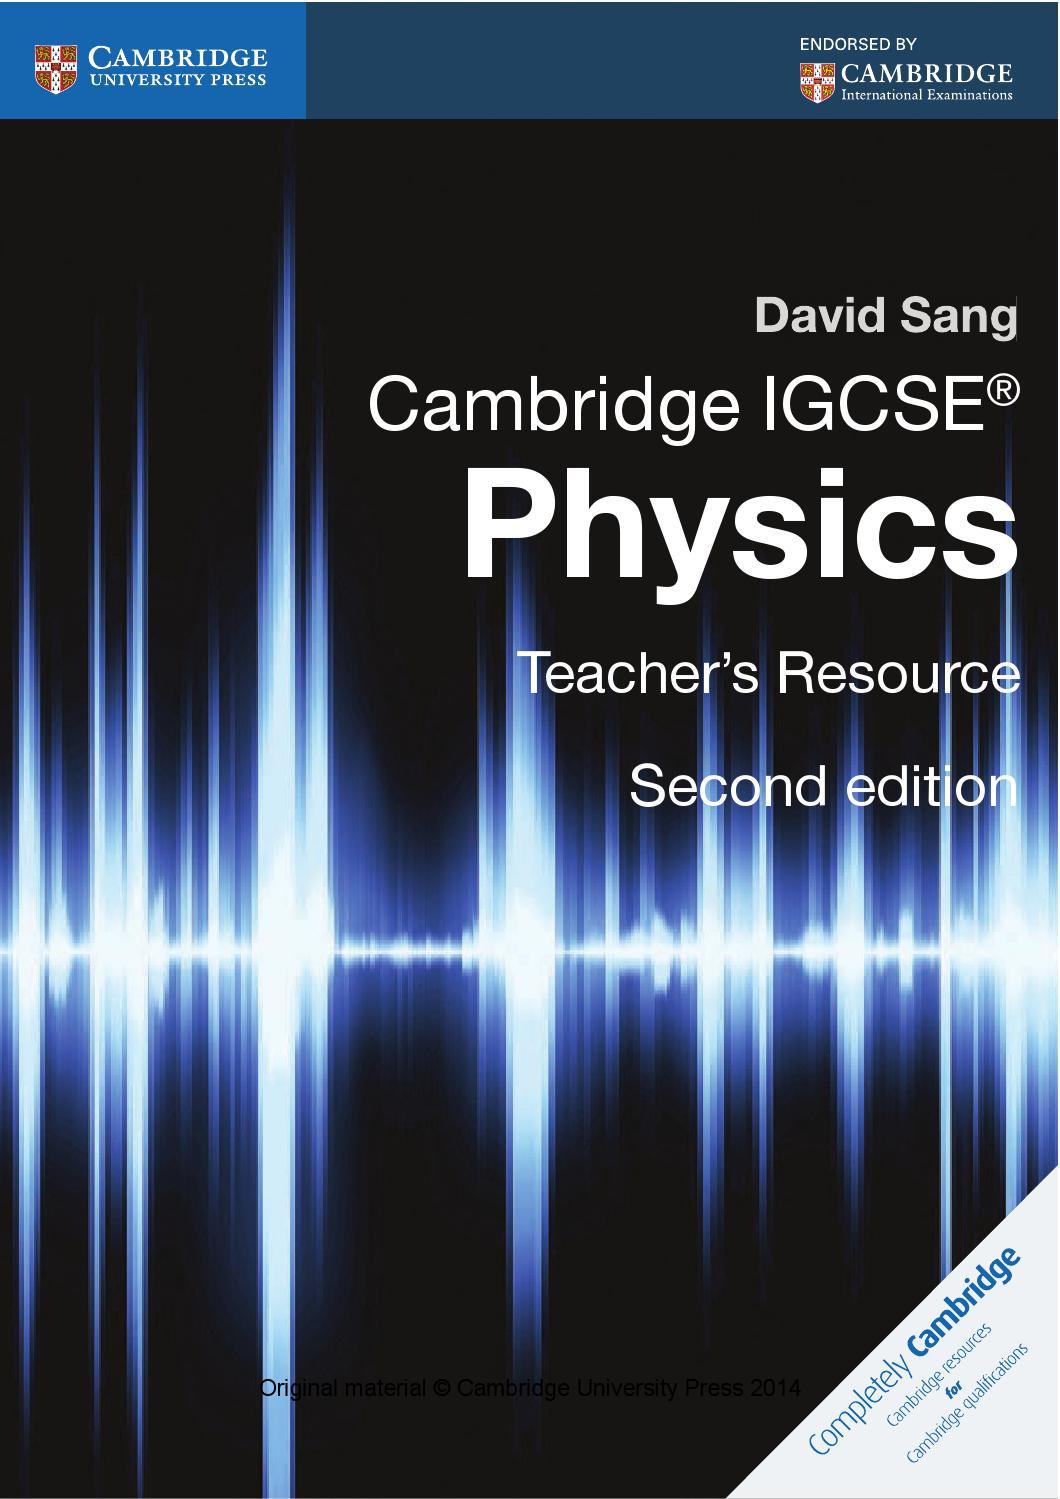 Cambridge igcse physics teachers resource second edition by cambridge igcse physics teachers resource second edition by cambridge university press education issuu fandeluxe Gallery